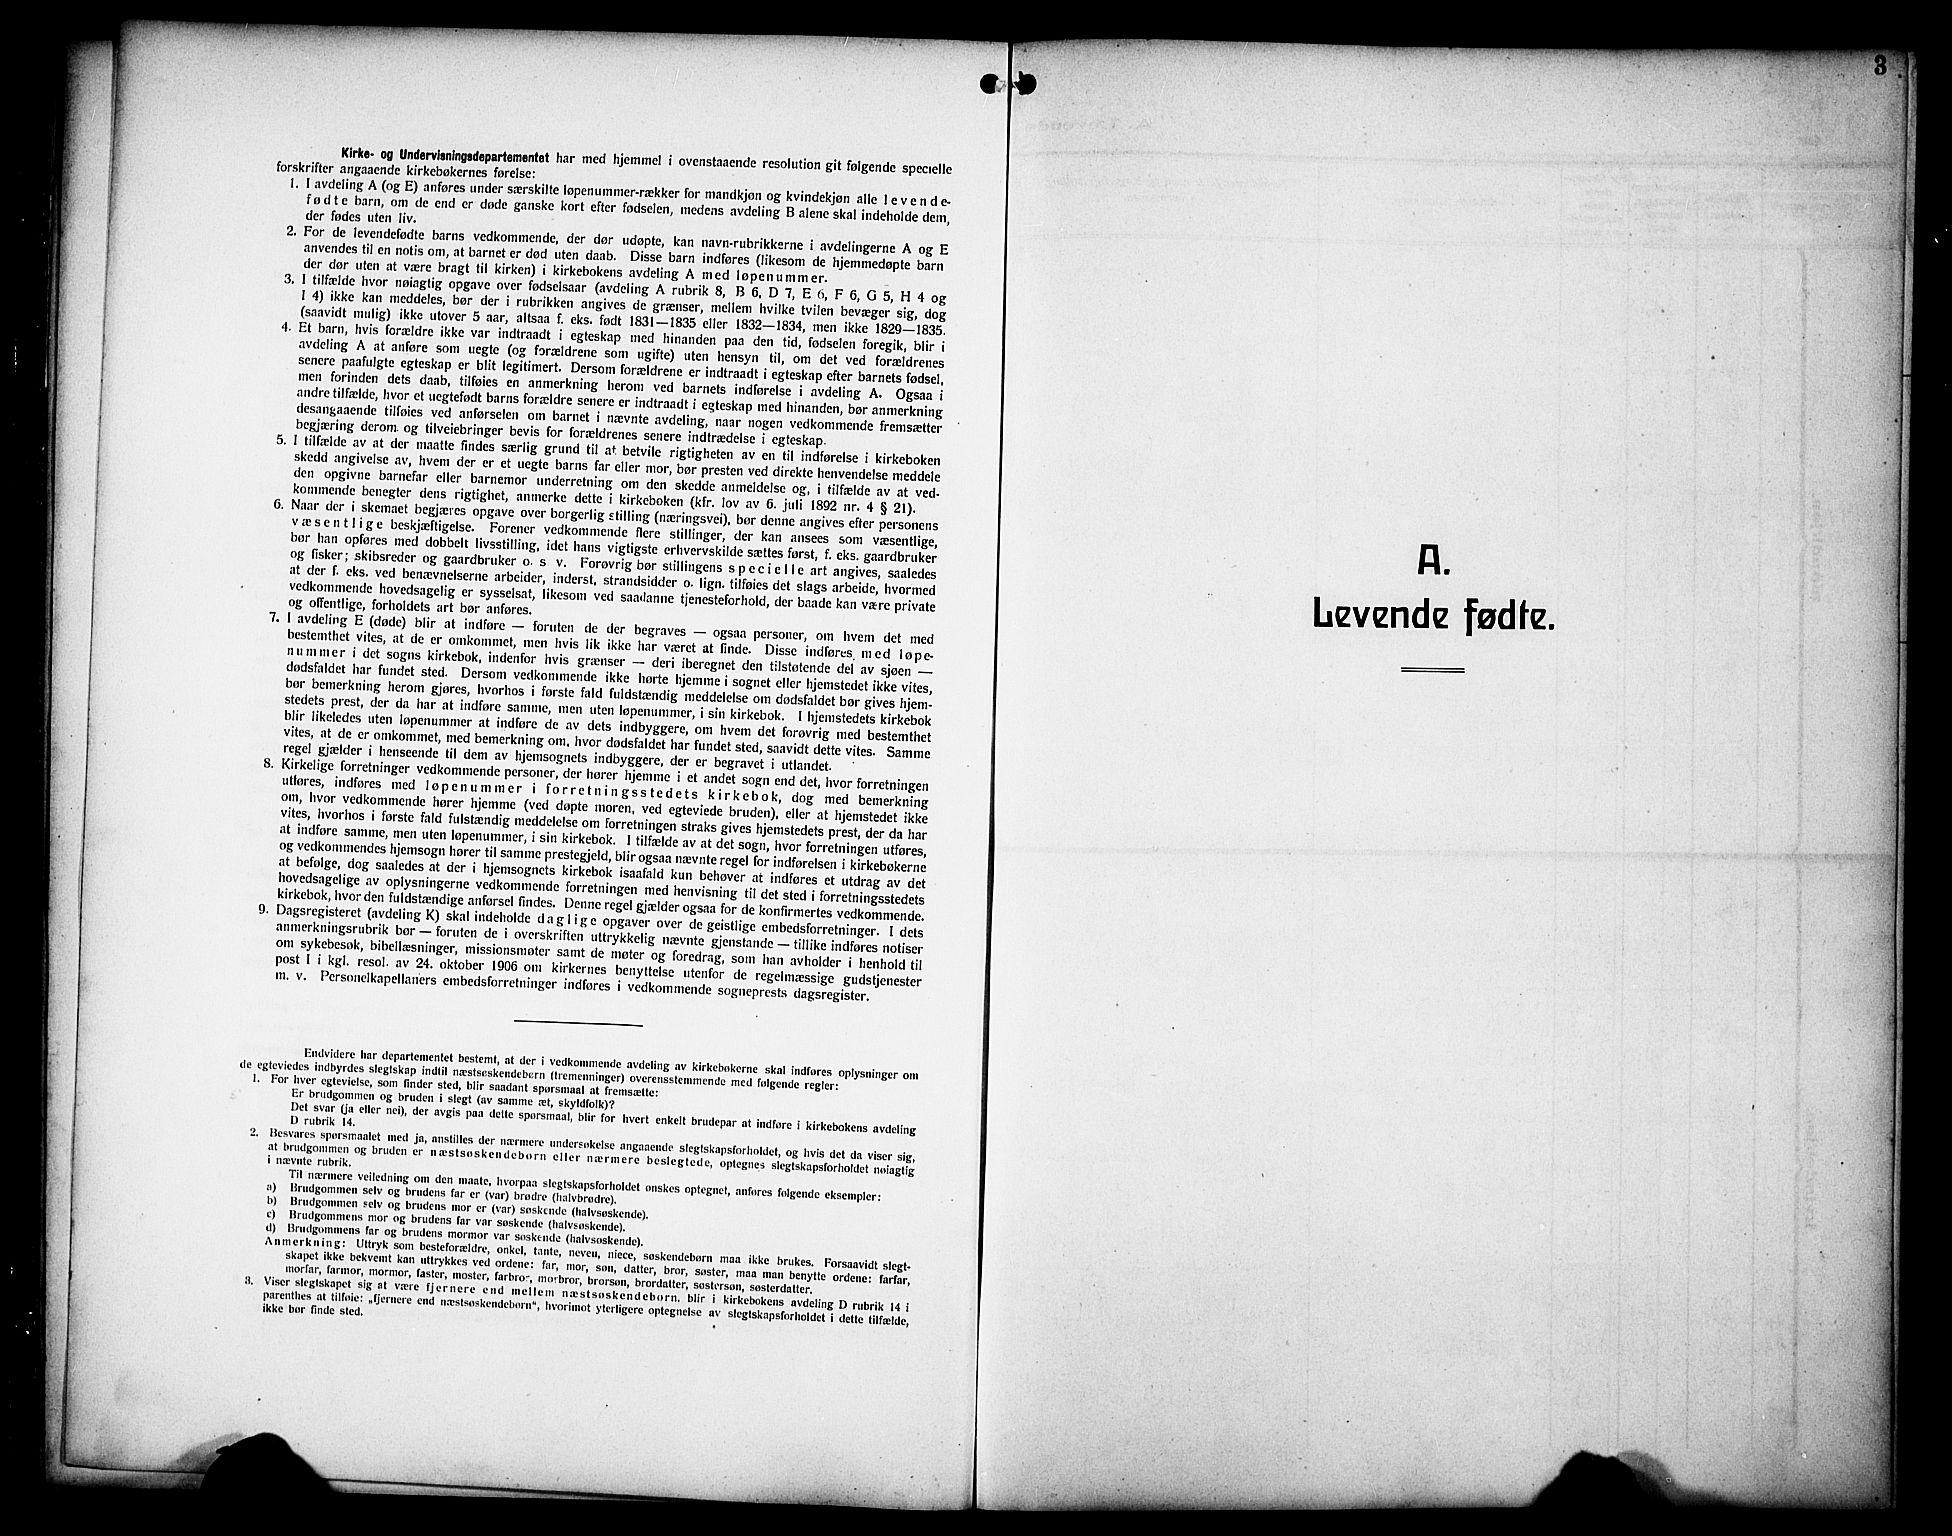 SAH, Øyer prestekontor, Klokkerbok nr. 7, 1913-1928, s. 3